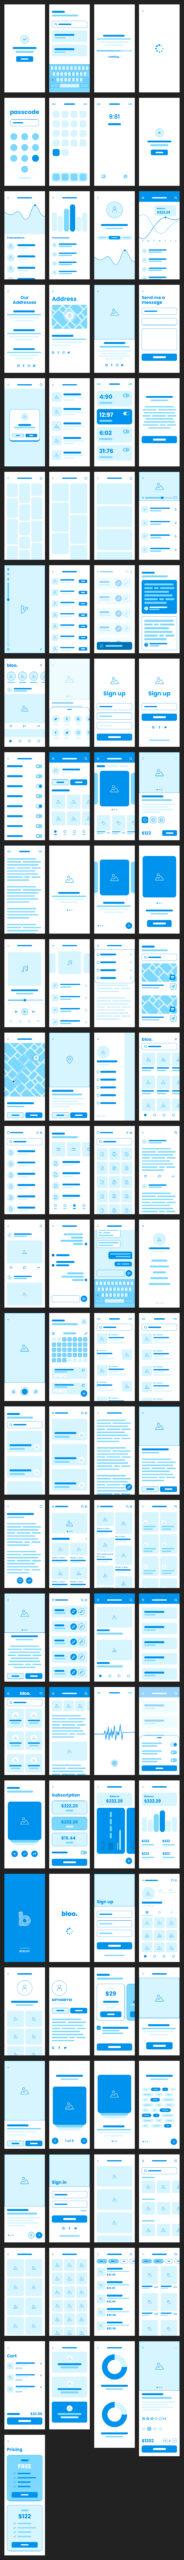 Bloo免费线框图设计UI套件插图